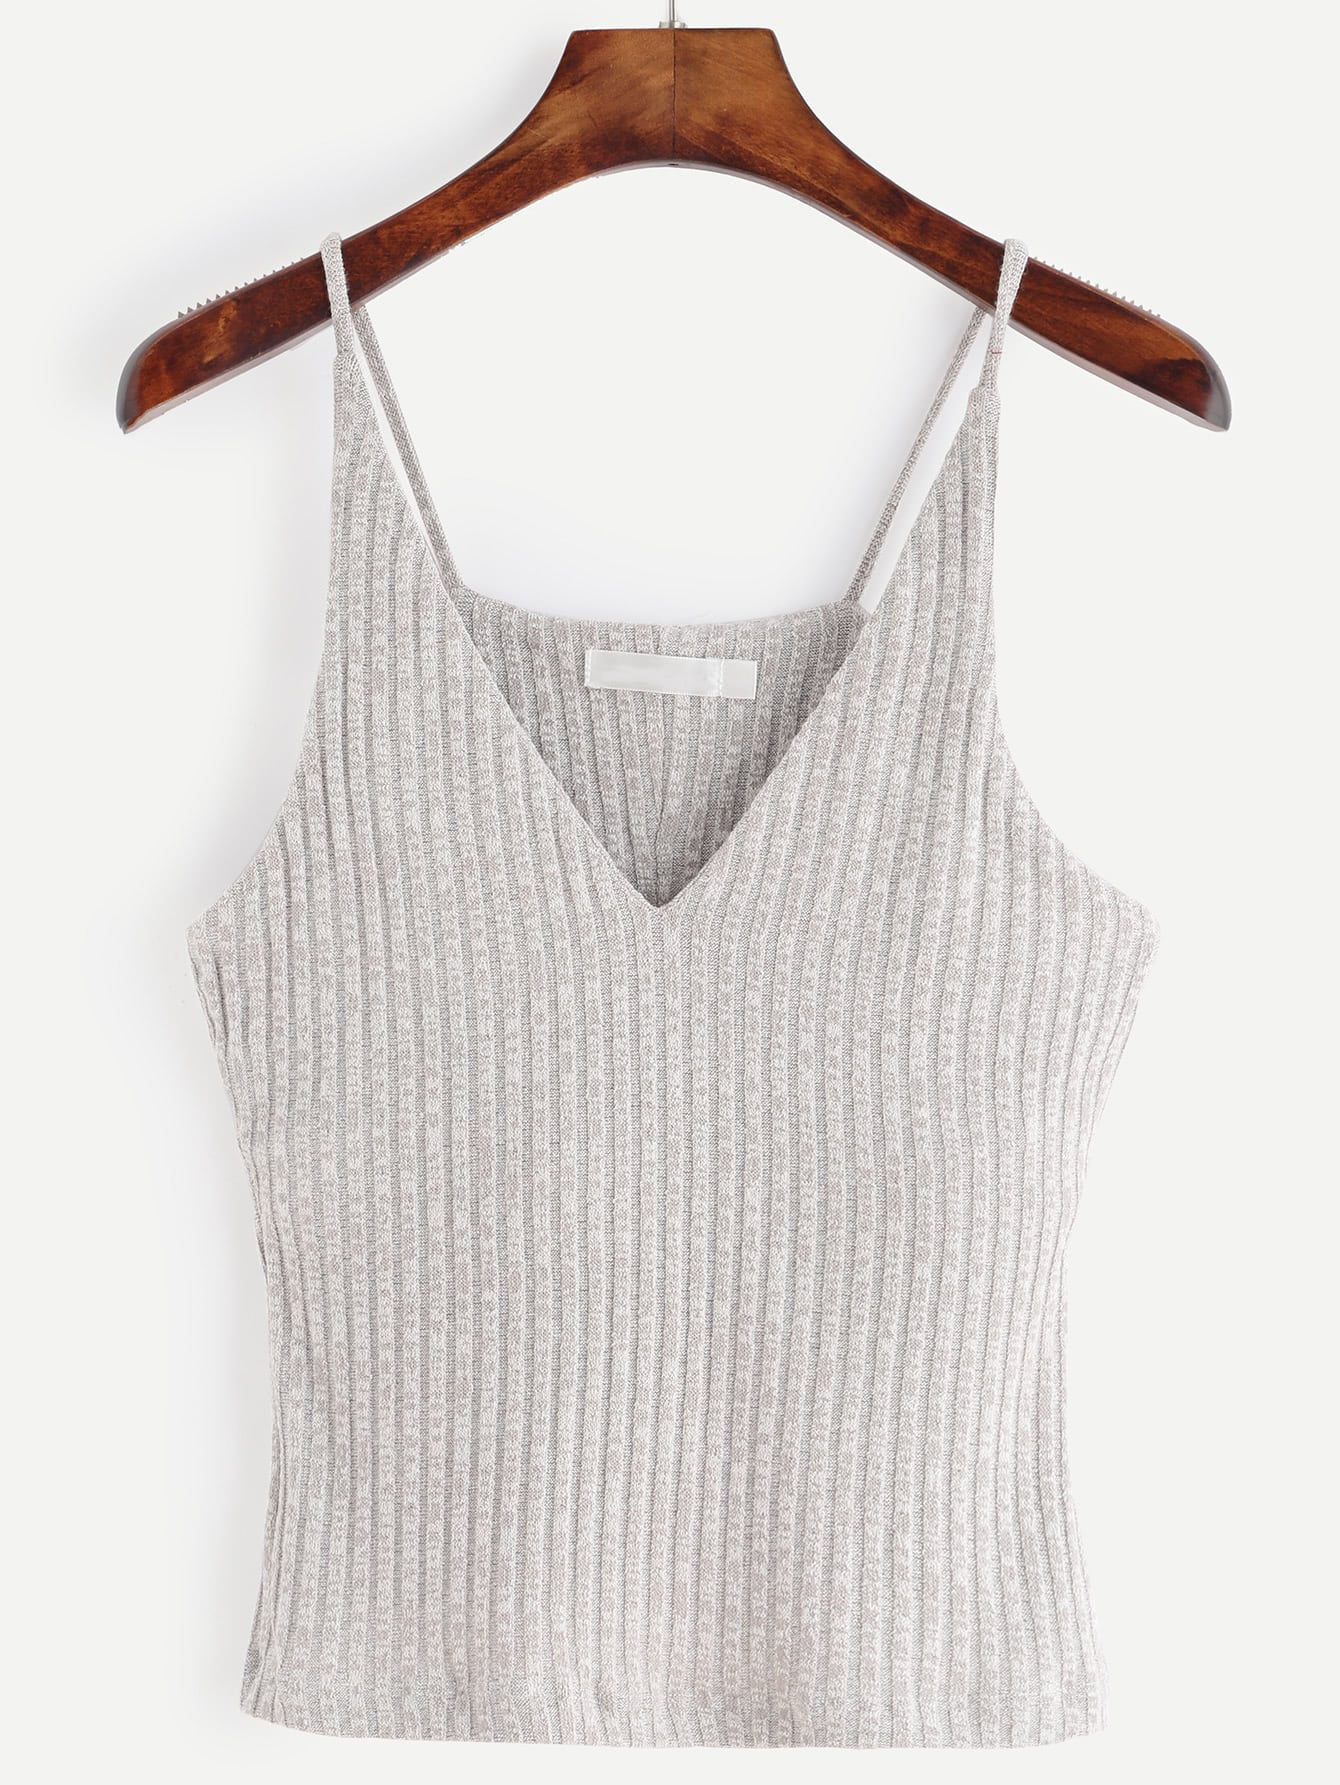 Grey Marled Knit Ribbed Cami Top vest160715007